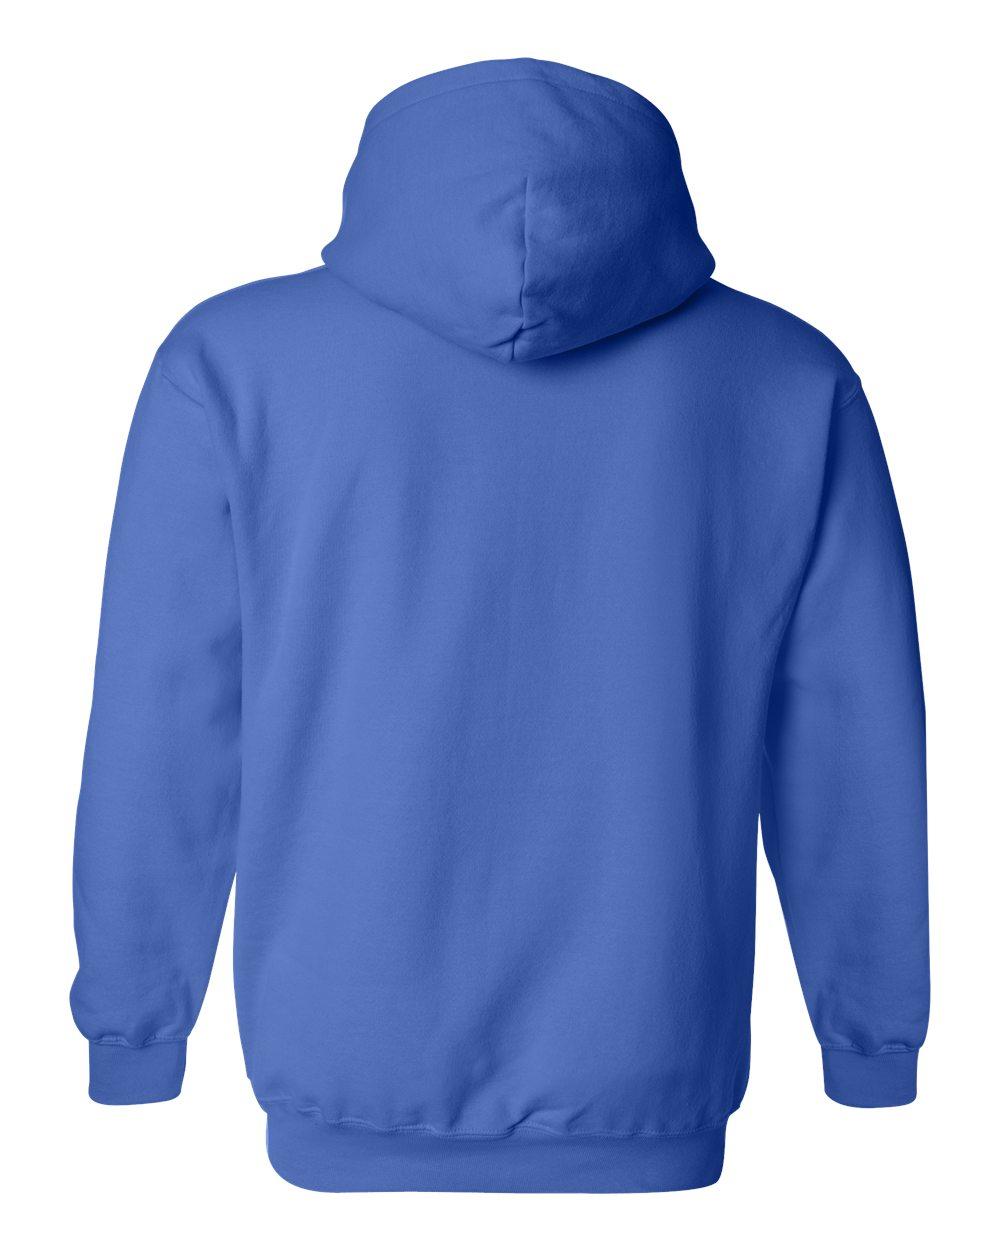 Gildan-Mens-Blank-Hoodie-Heavy-Blend-Hooded-Sweatshirt-Solid-18500-up-to-5XL thumbnail 78